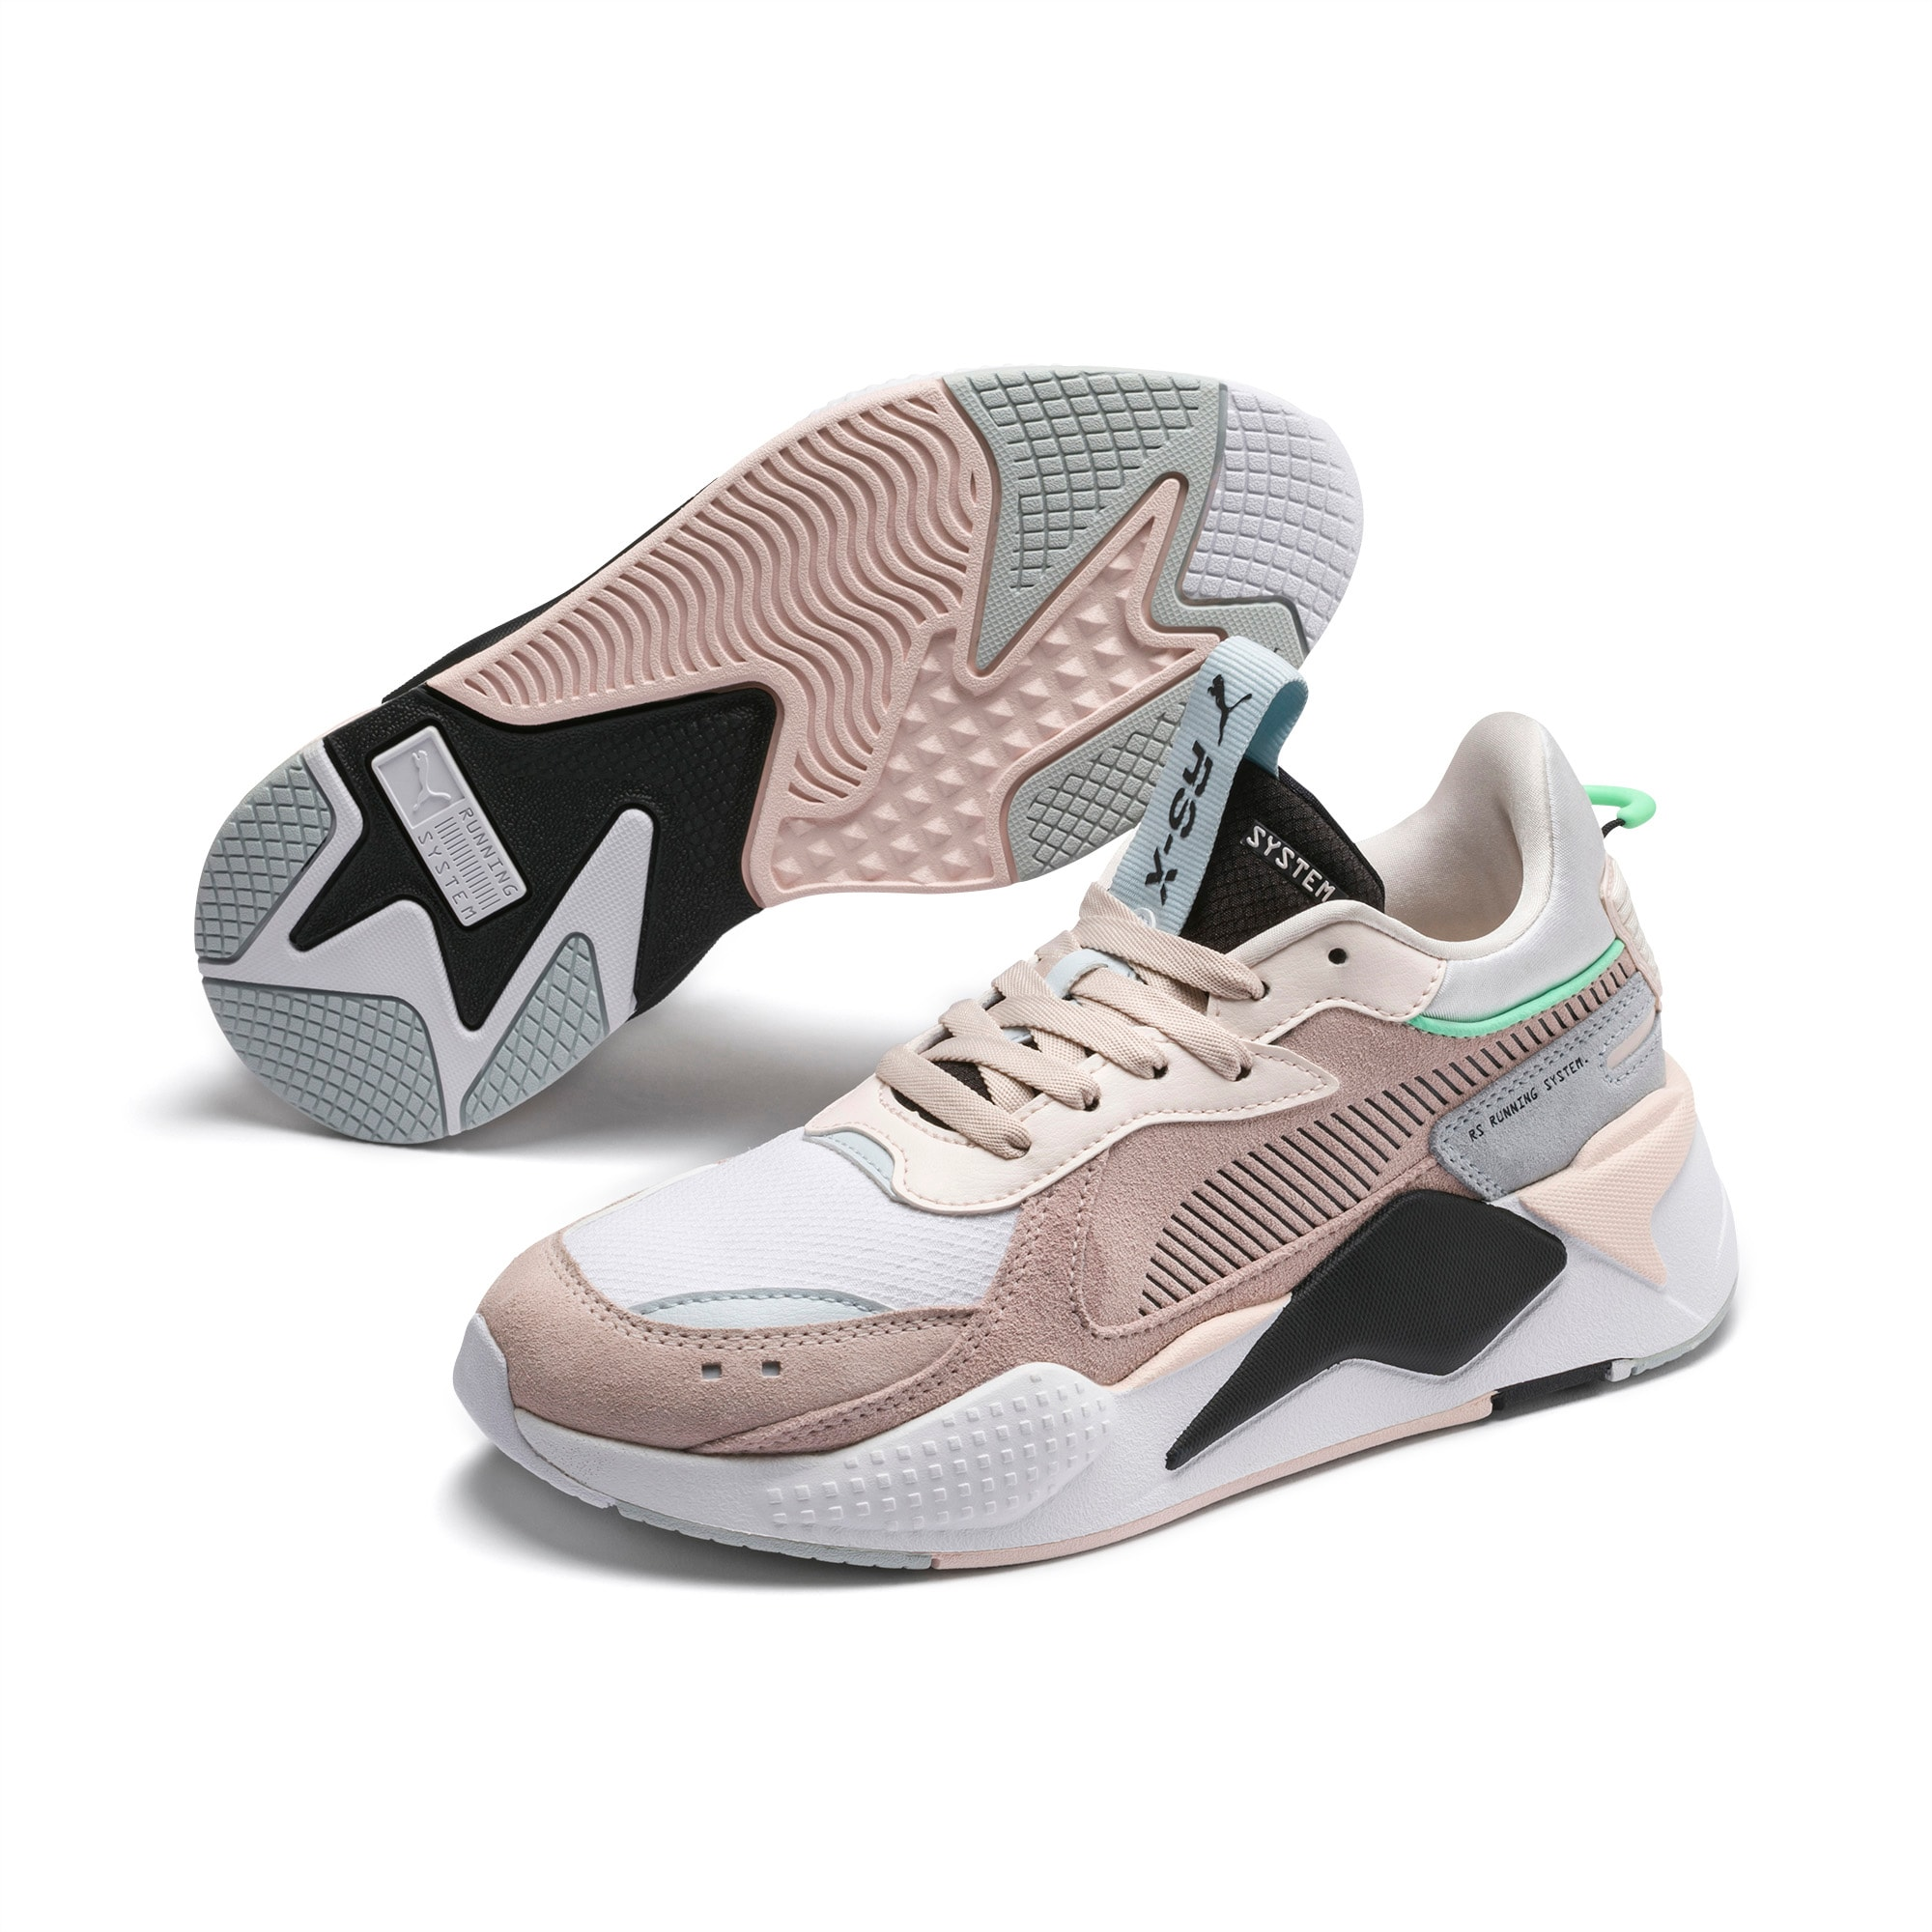 Puma 010 Scarpe* 371008 04 | Euforie Shop Online